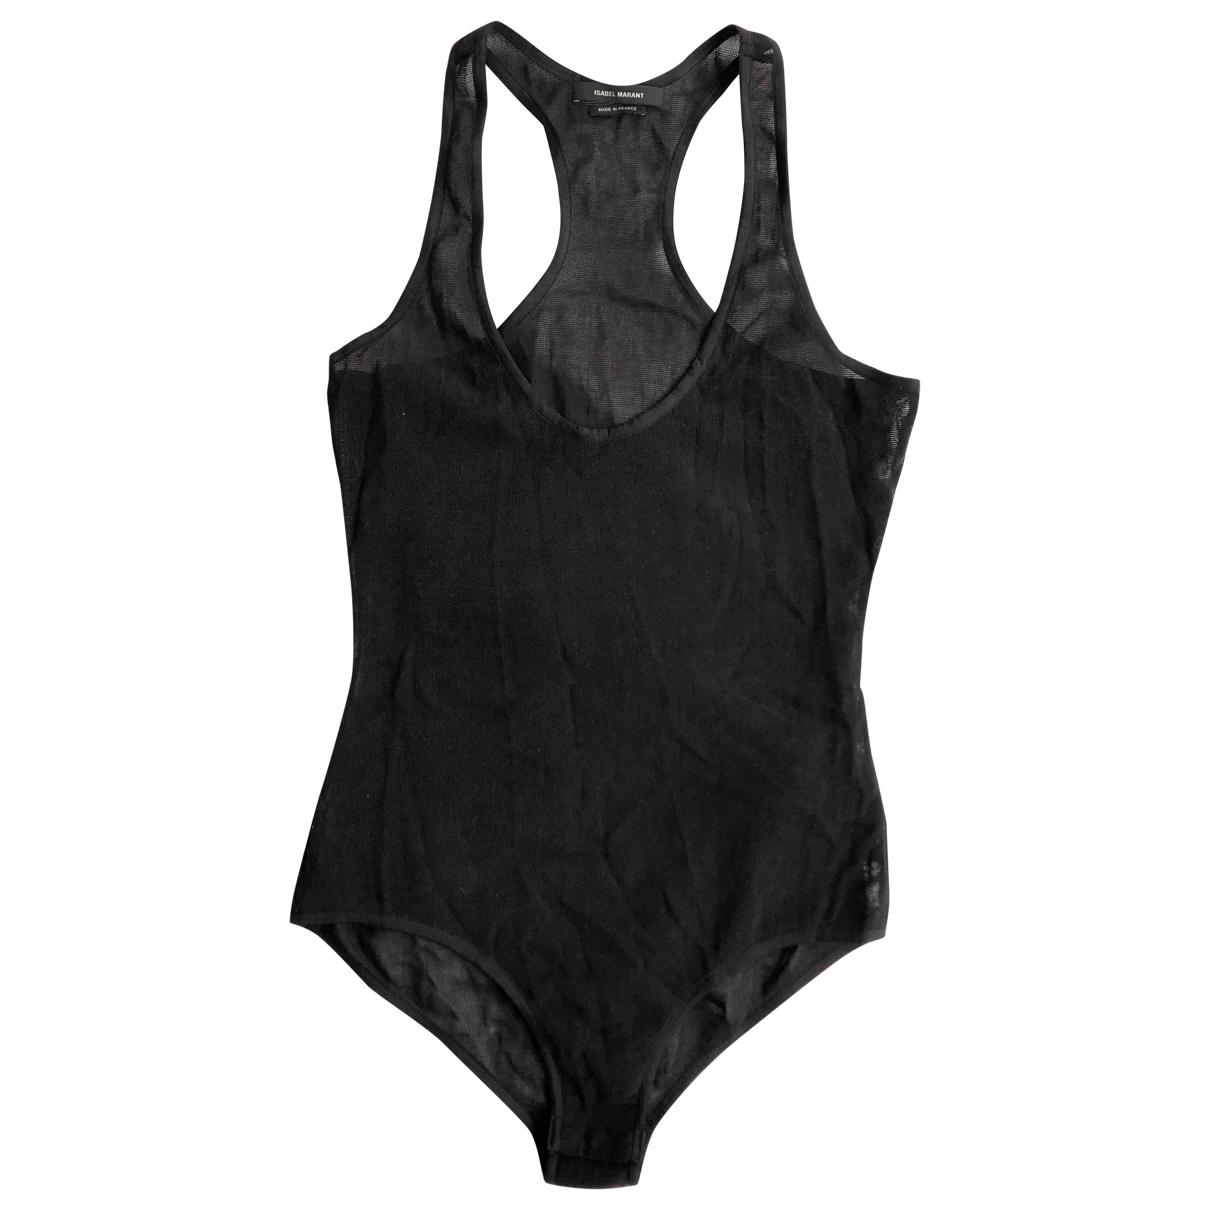 Isabel Marant \N Black Cotton  top for Women S International